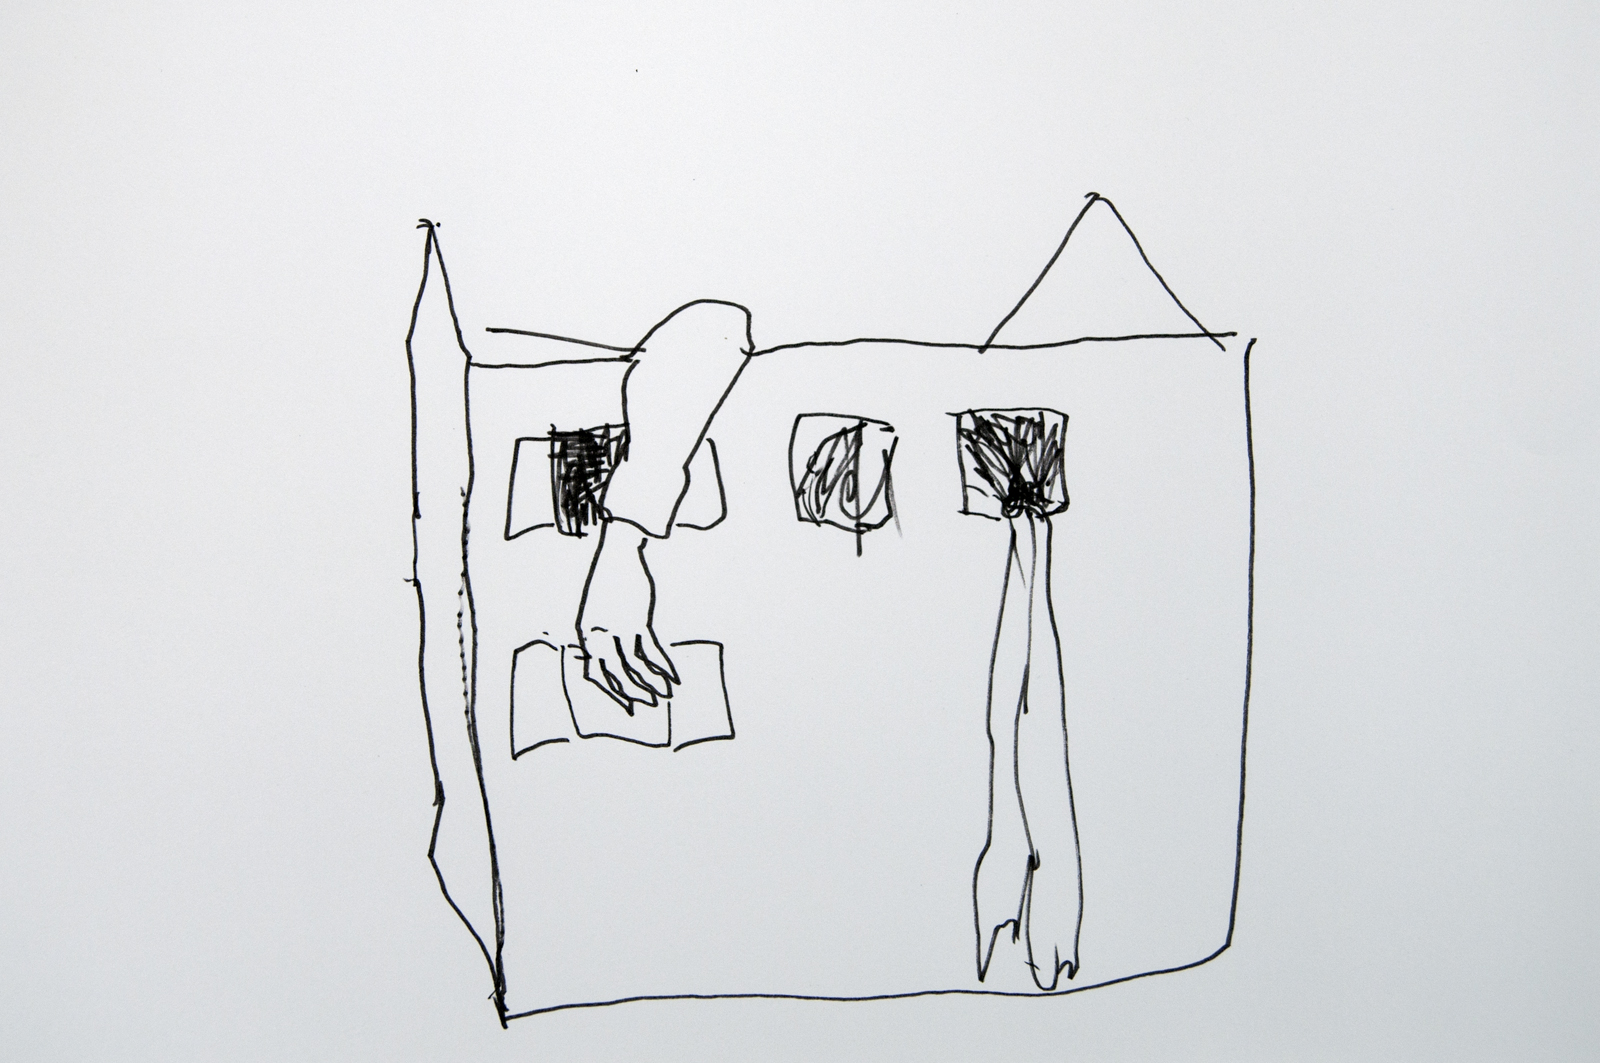 2013_Haus-im-Kopf_Skizzen_08